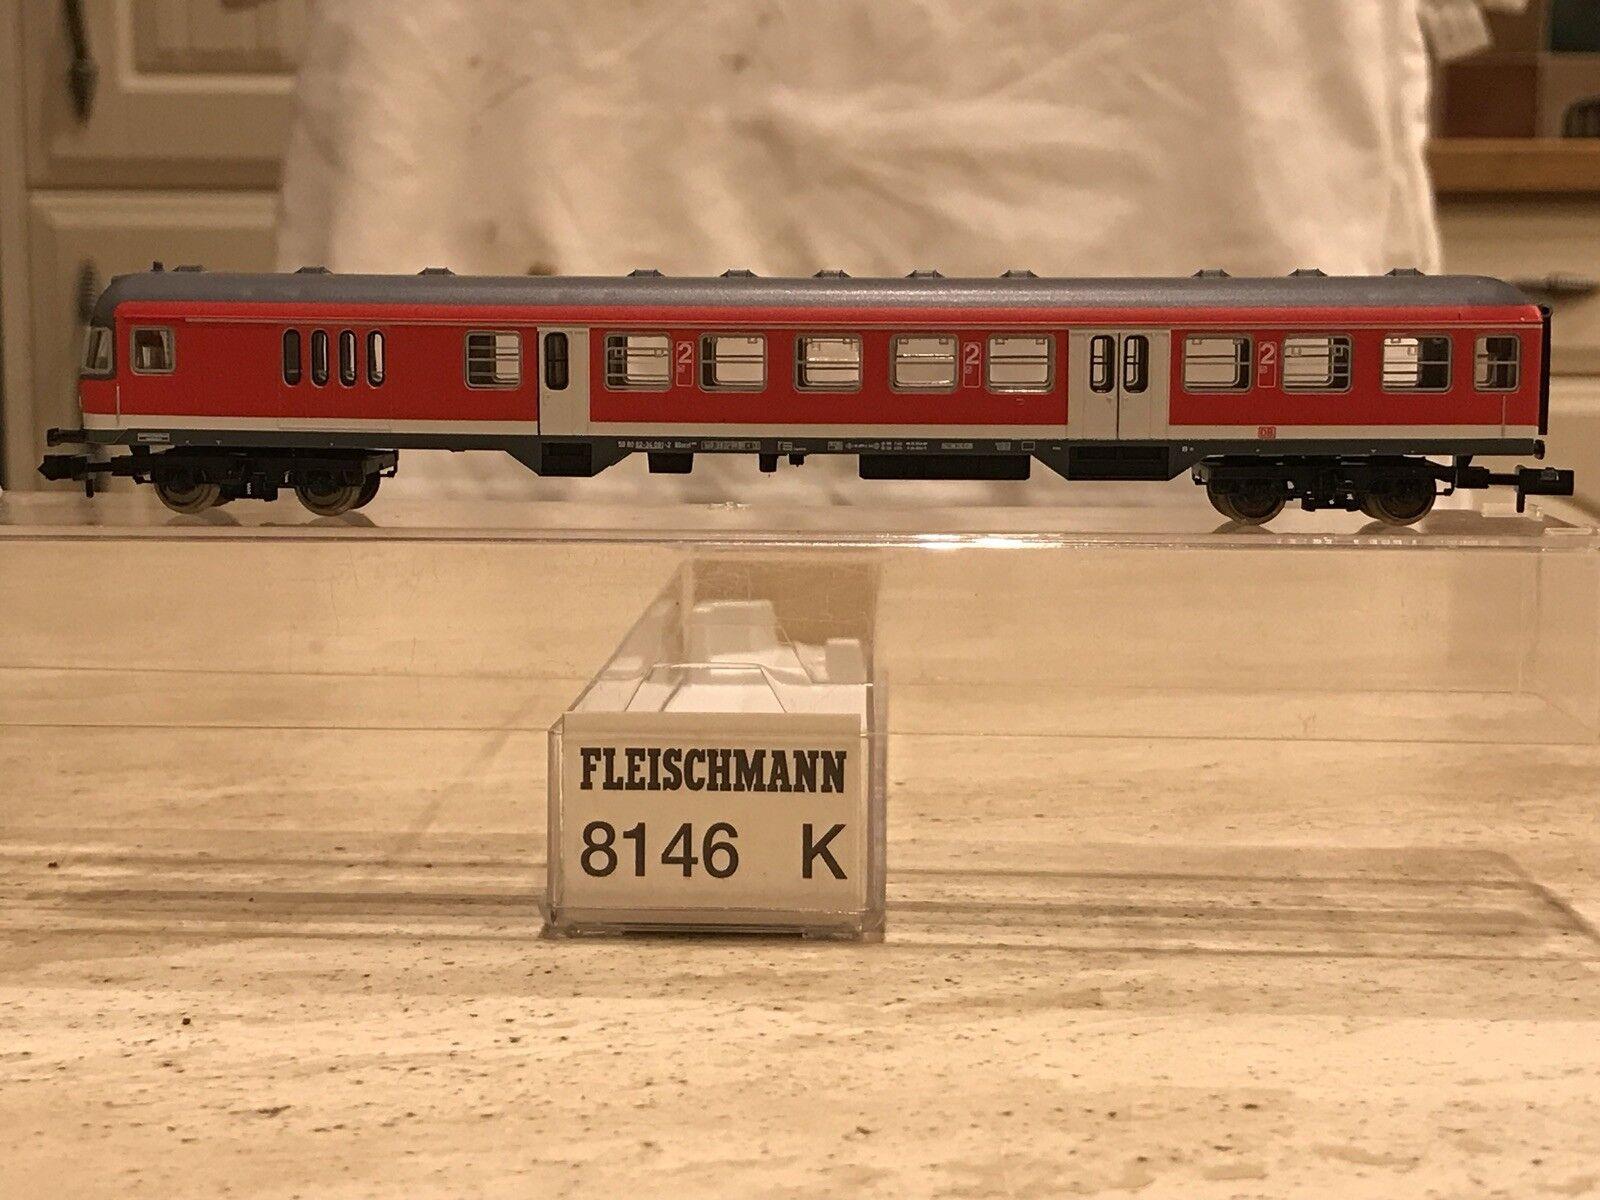 Fleischmann N Gauge Gauge Gauge 8146k 8147k 8148k All mint in correct boxes. (Rare to find)1 5a0cca